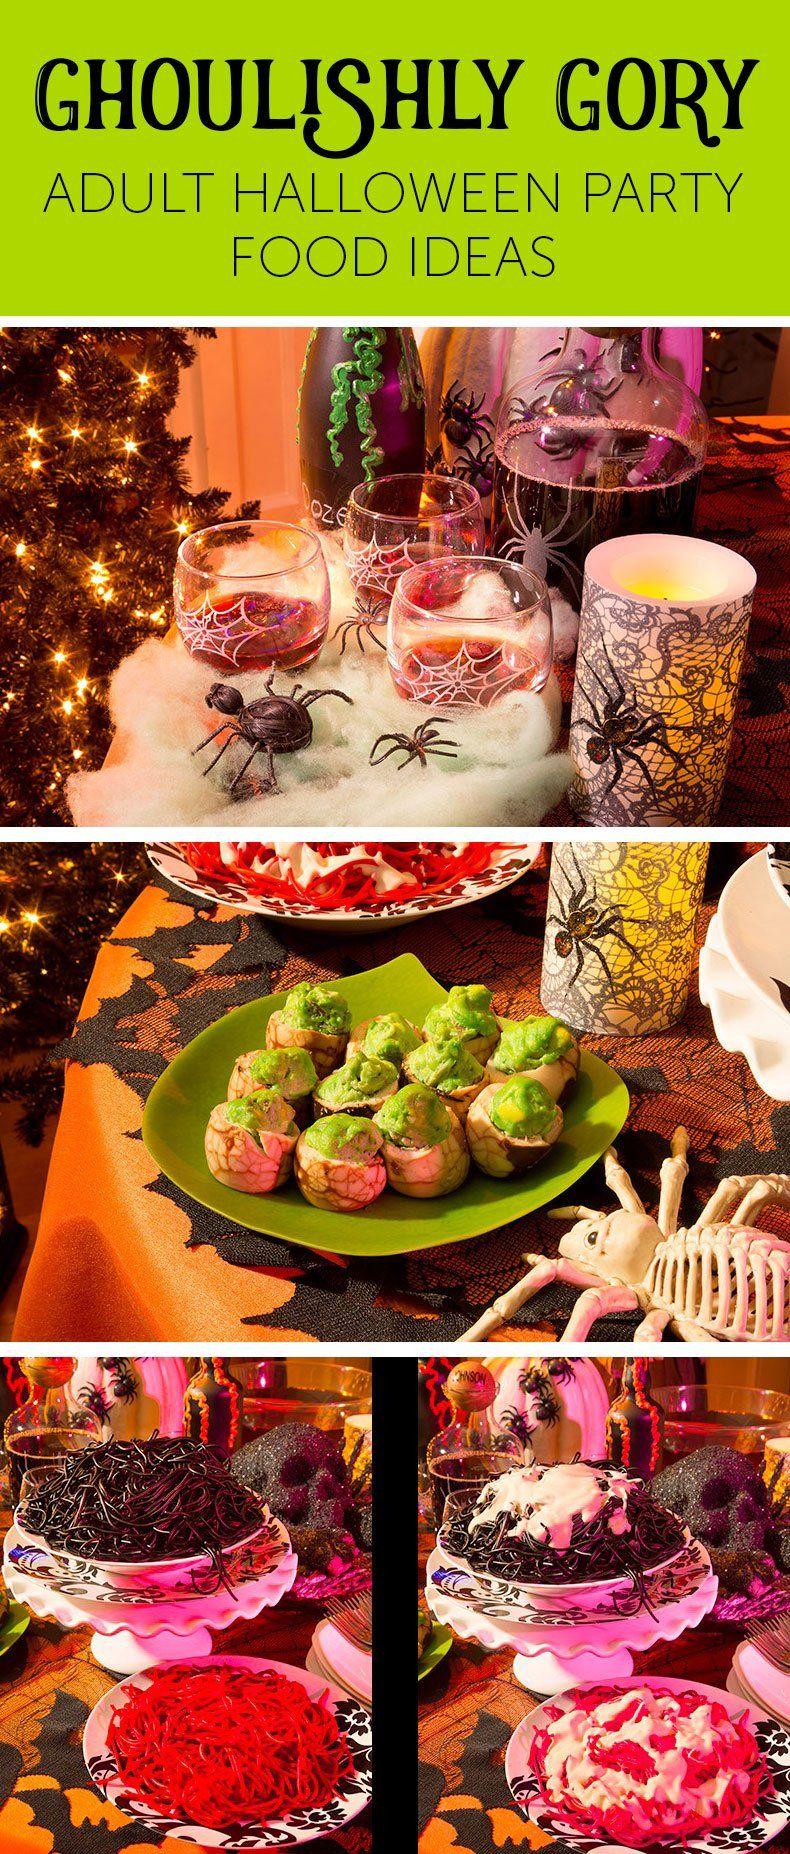 Halloween Food Ideas for an Adult Halloween Party Easy